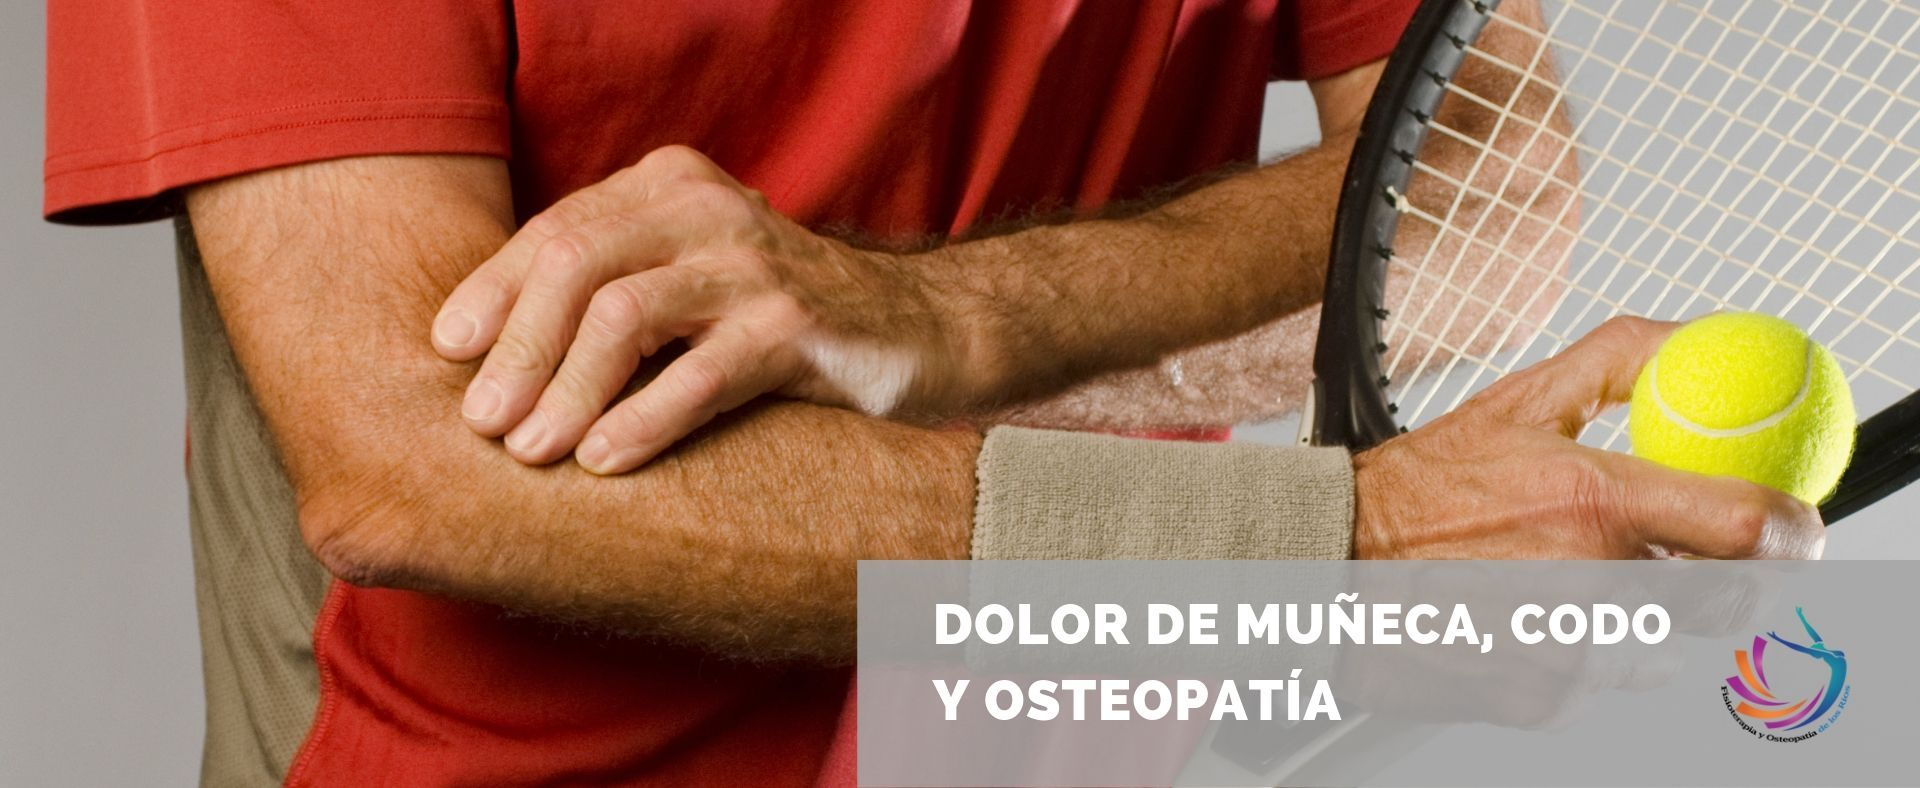 Codo, muñeca y osteopatía